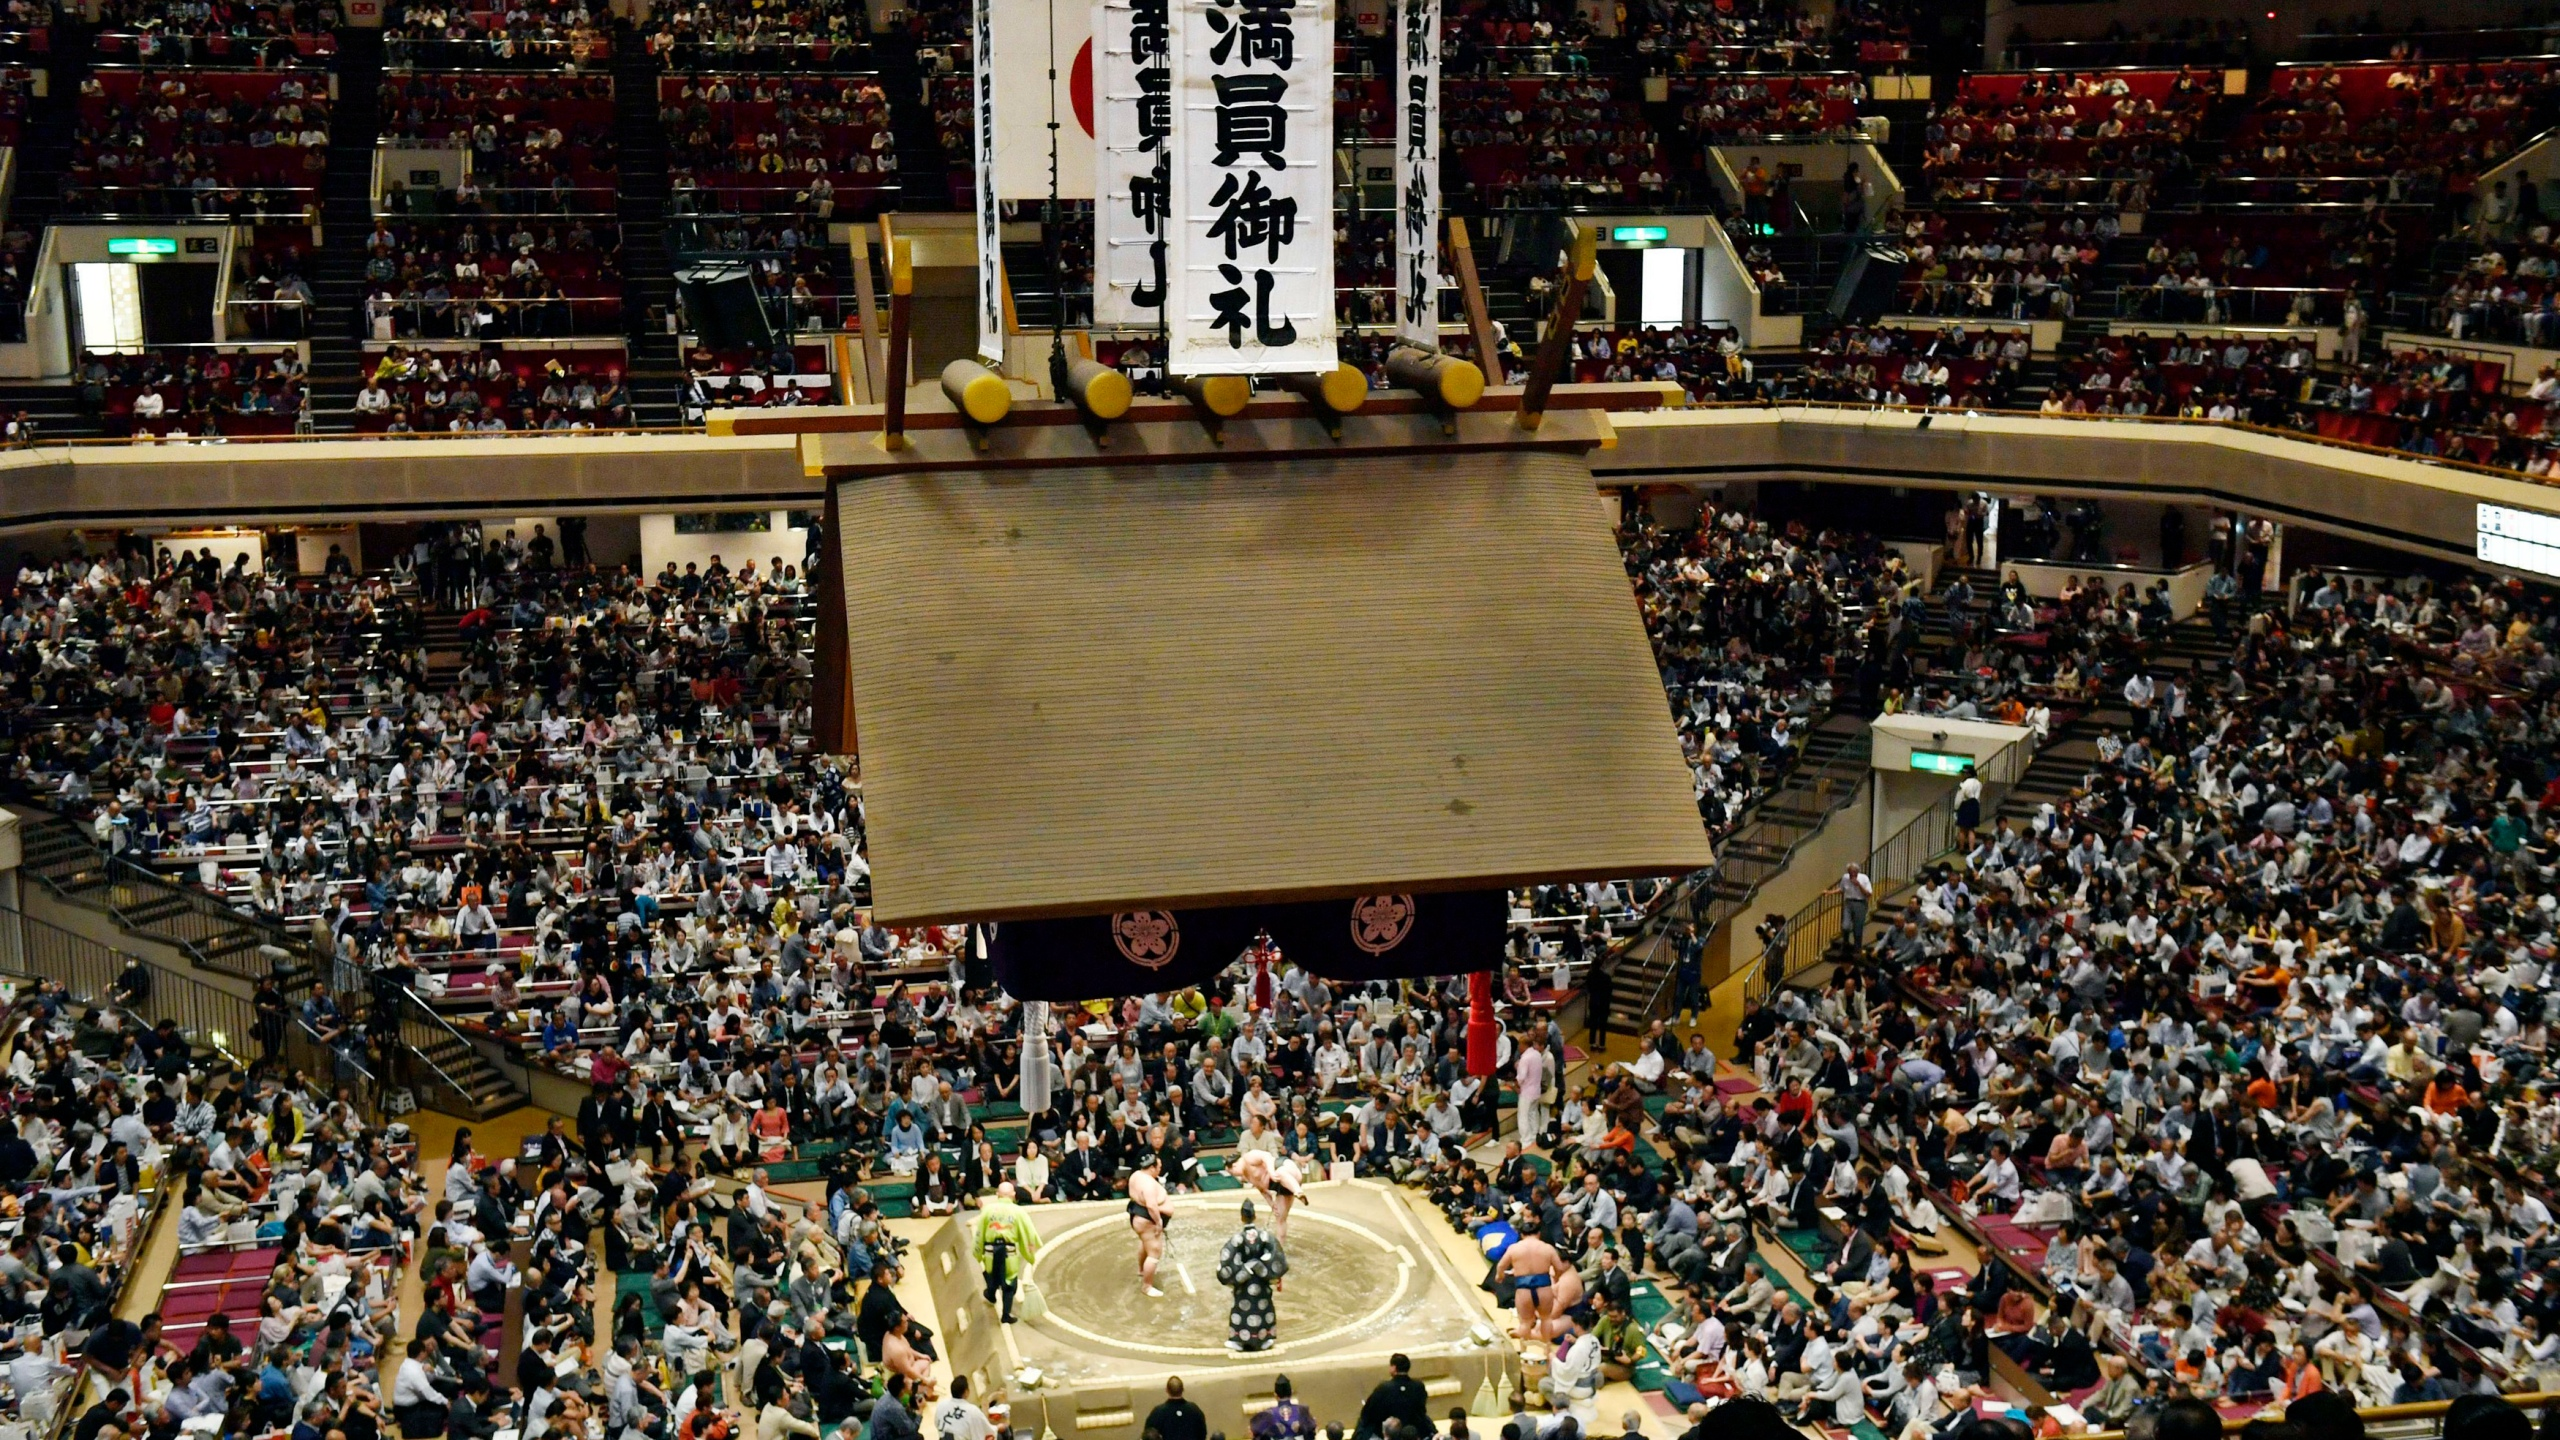 Japan_Trump_71112-159532.jpg51729066